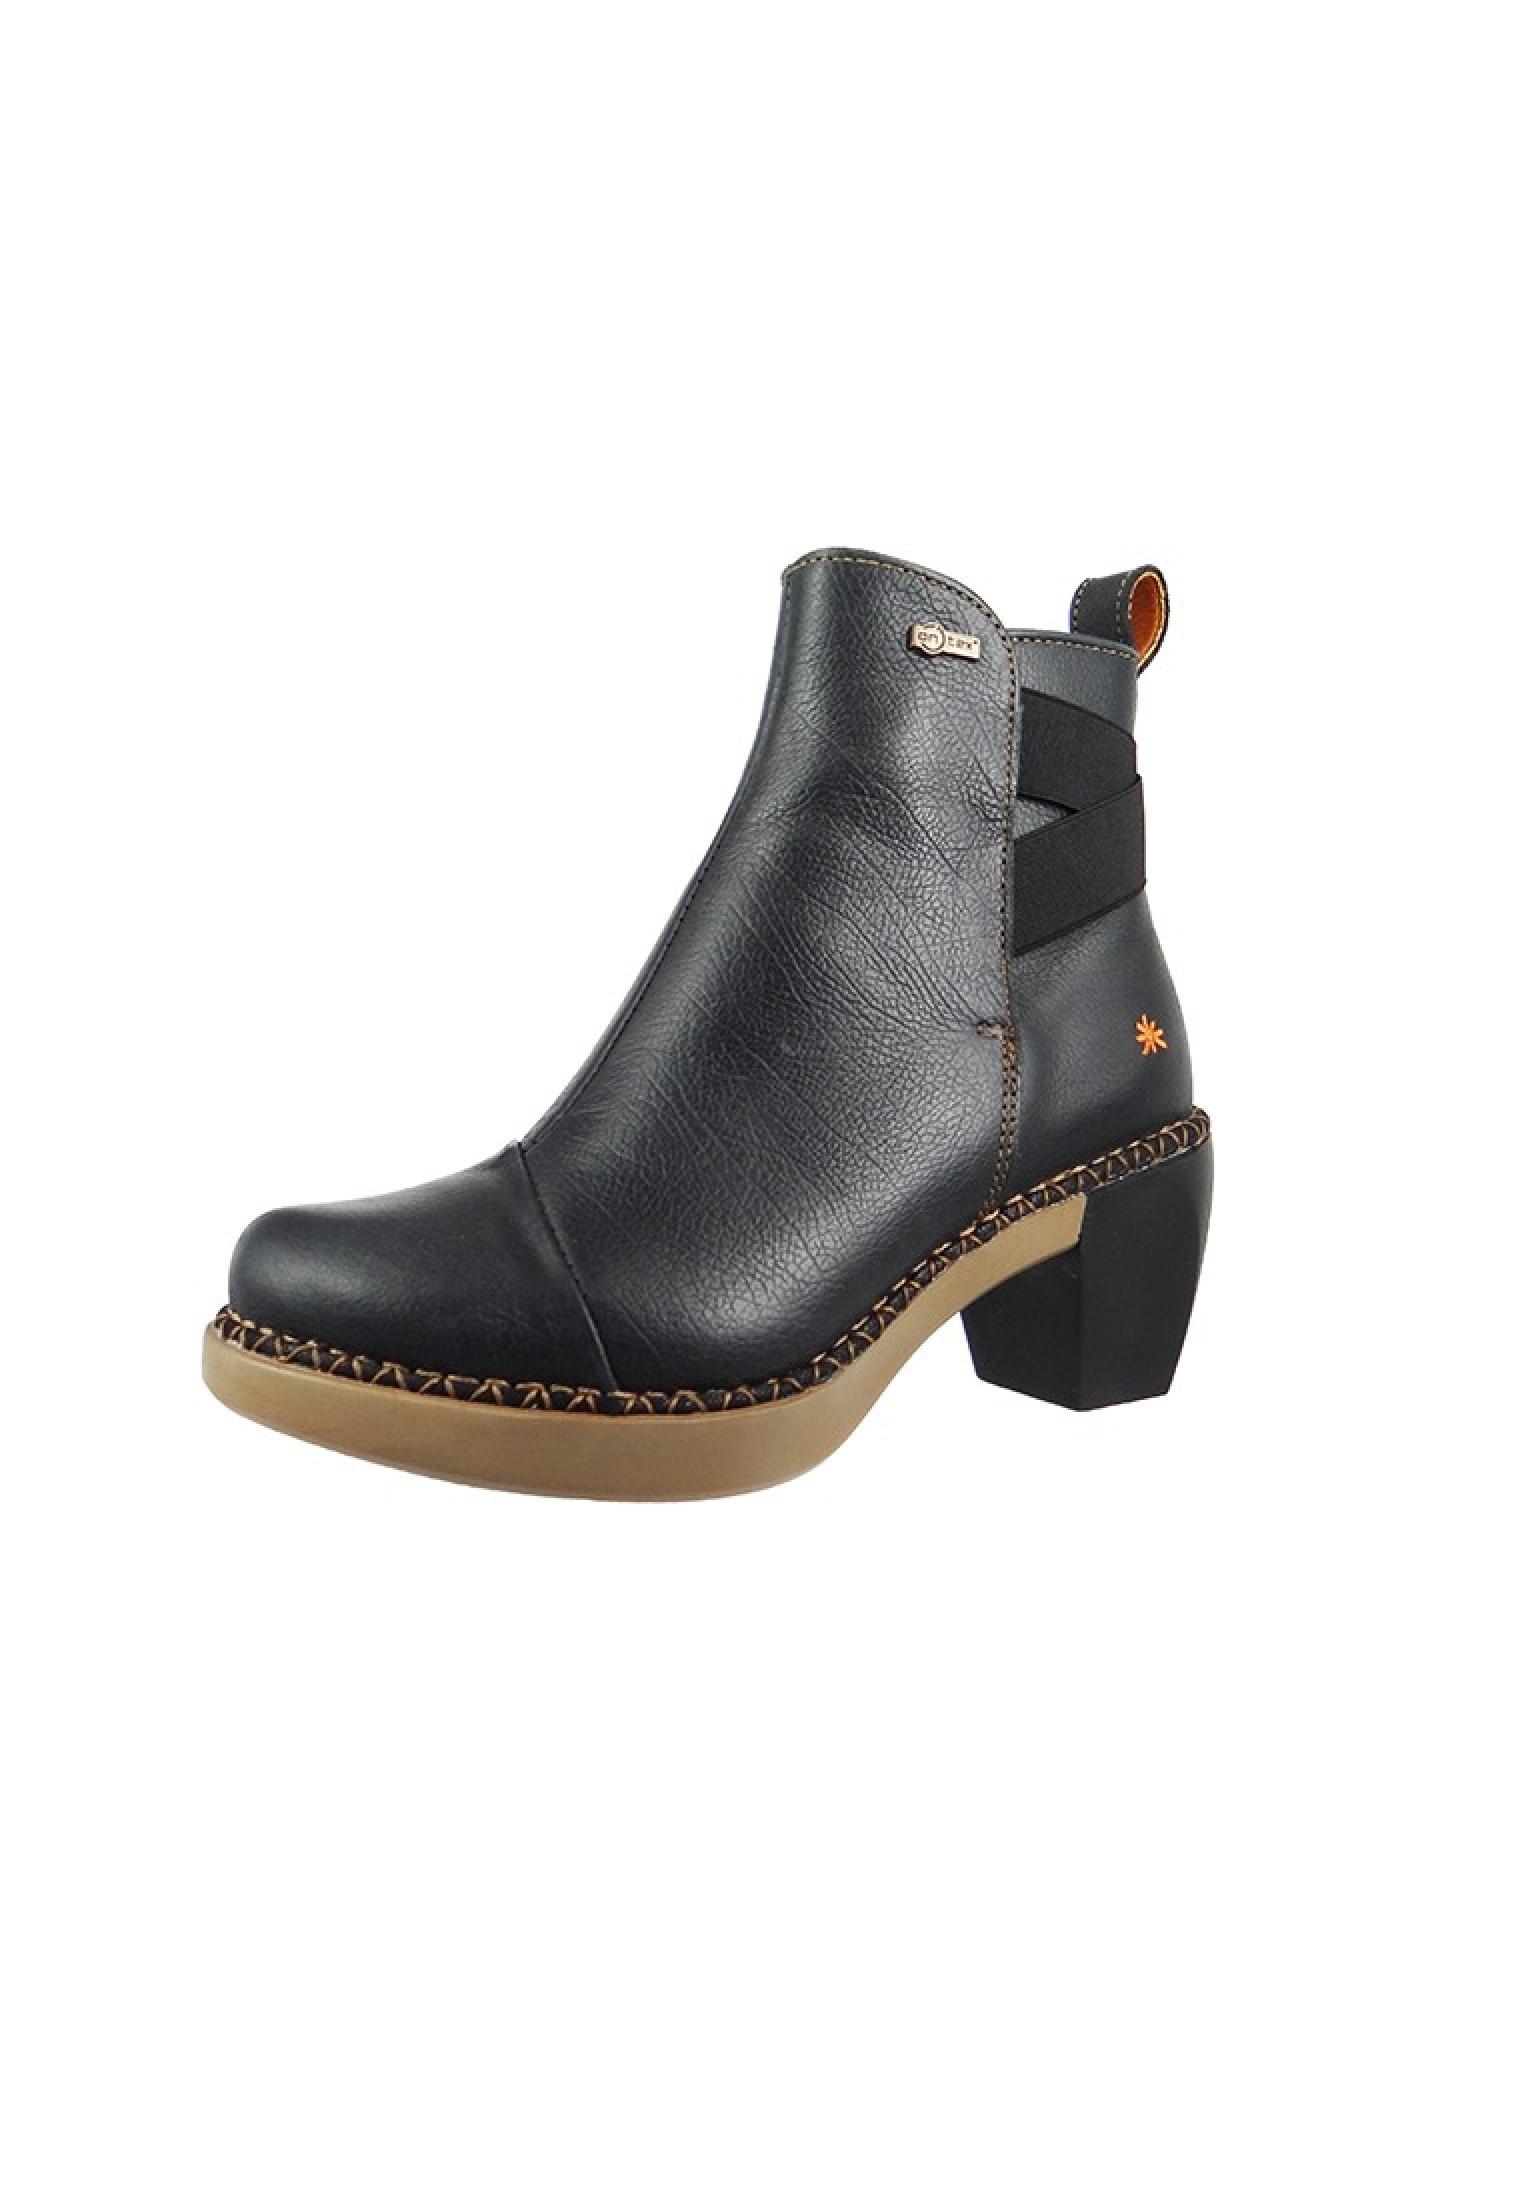 Art Leder Stiefelette Ankle bota bota Ankle Madrid Negro Schwarz 1152 Gr.  36 - 41 c805c7 1ece6bda24